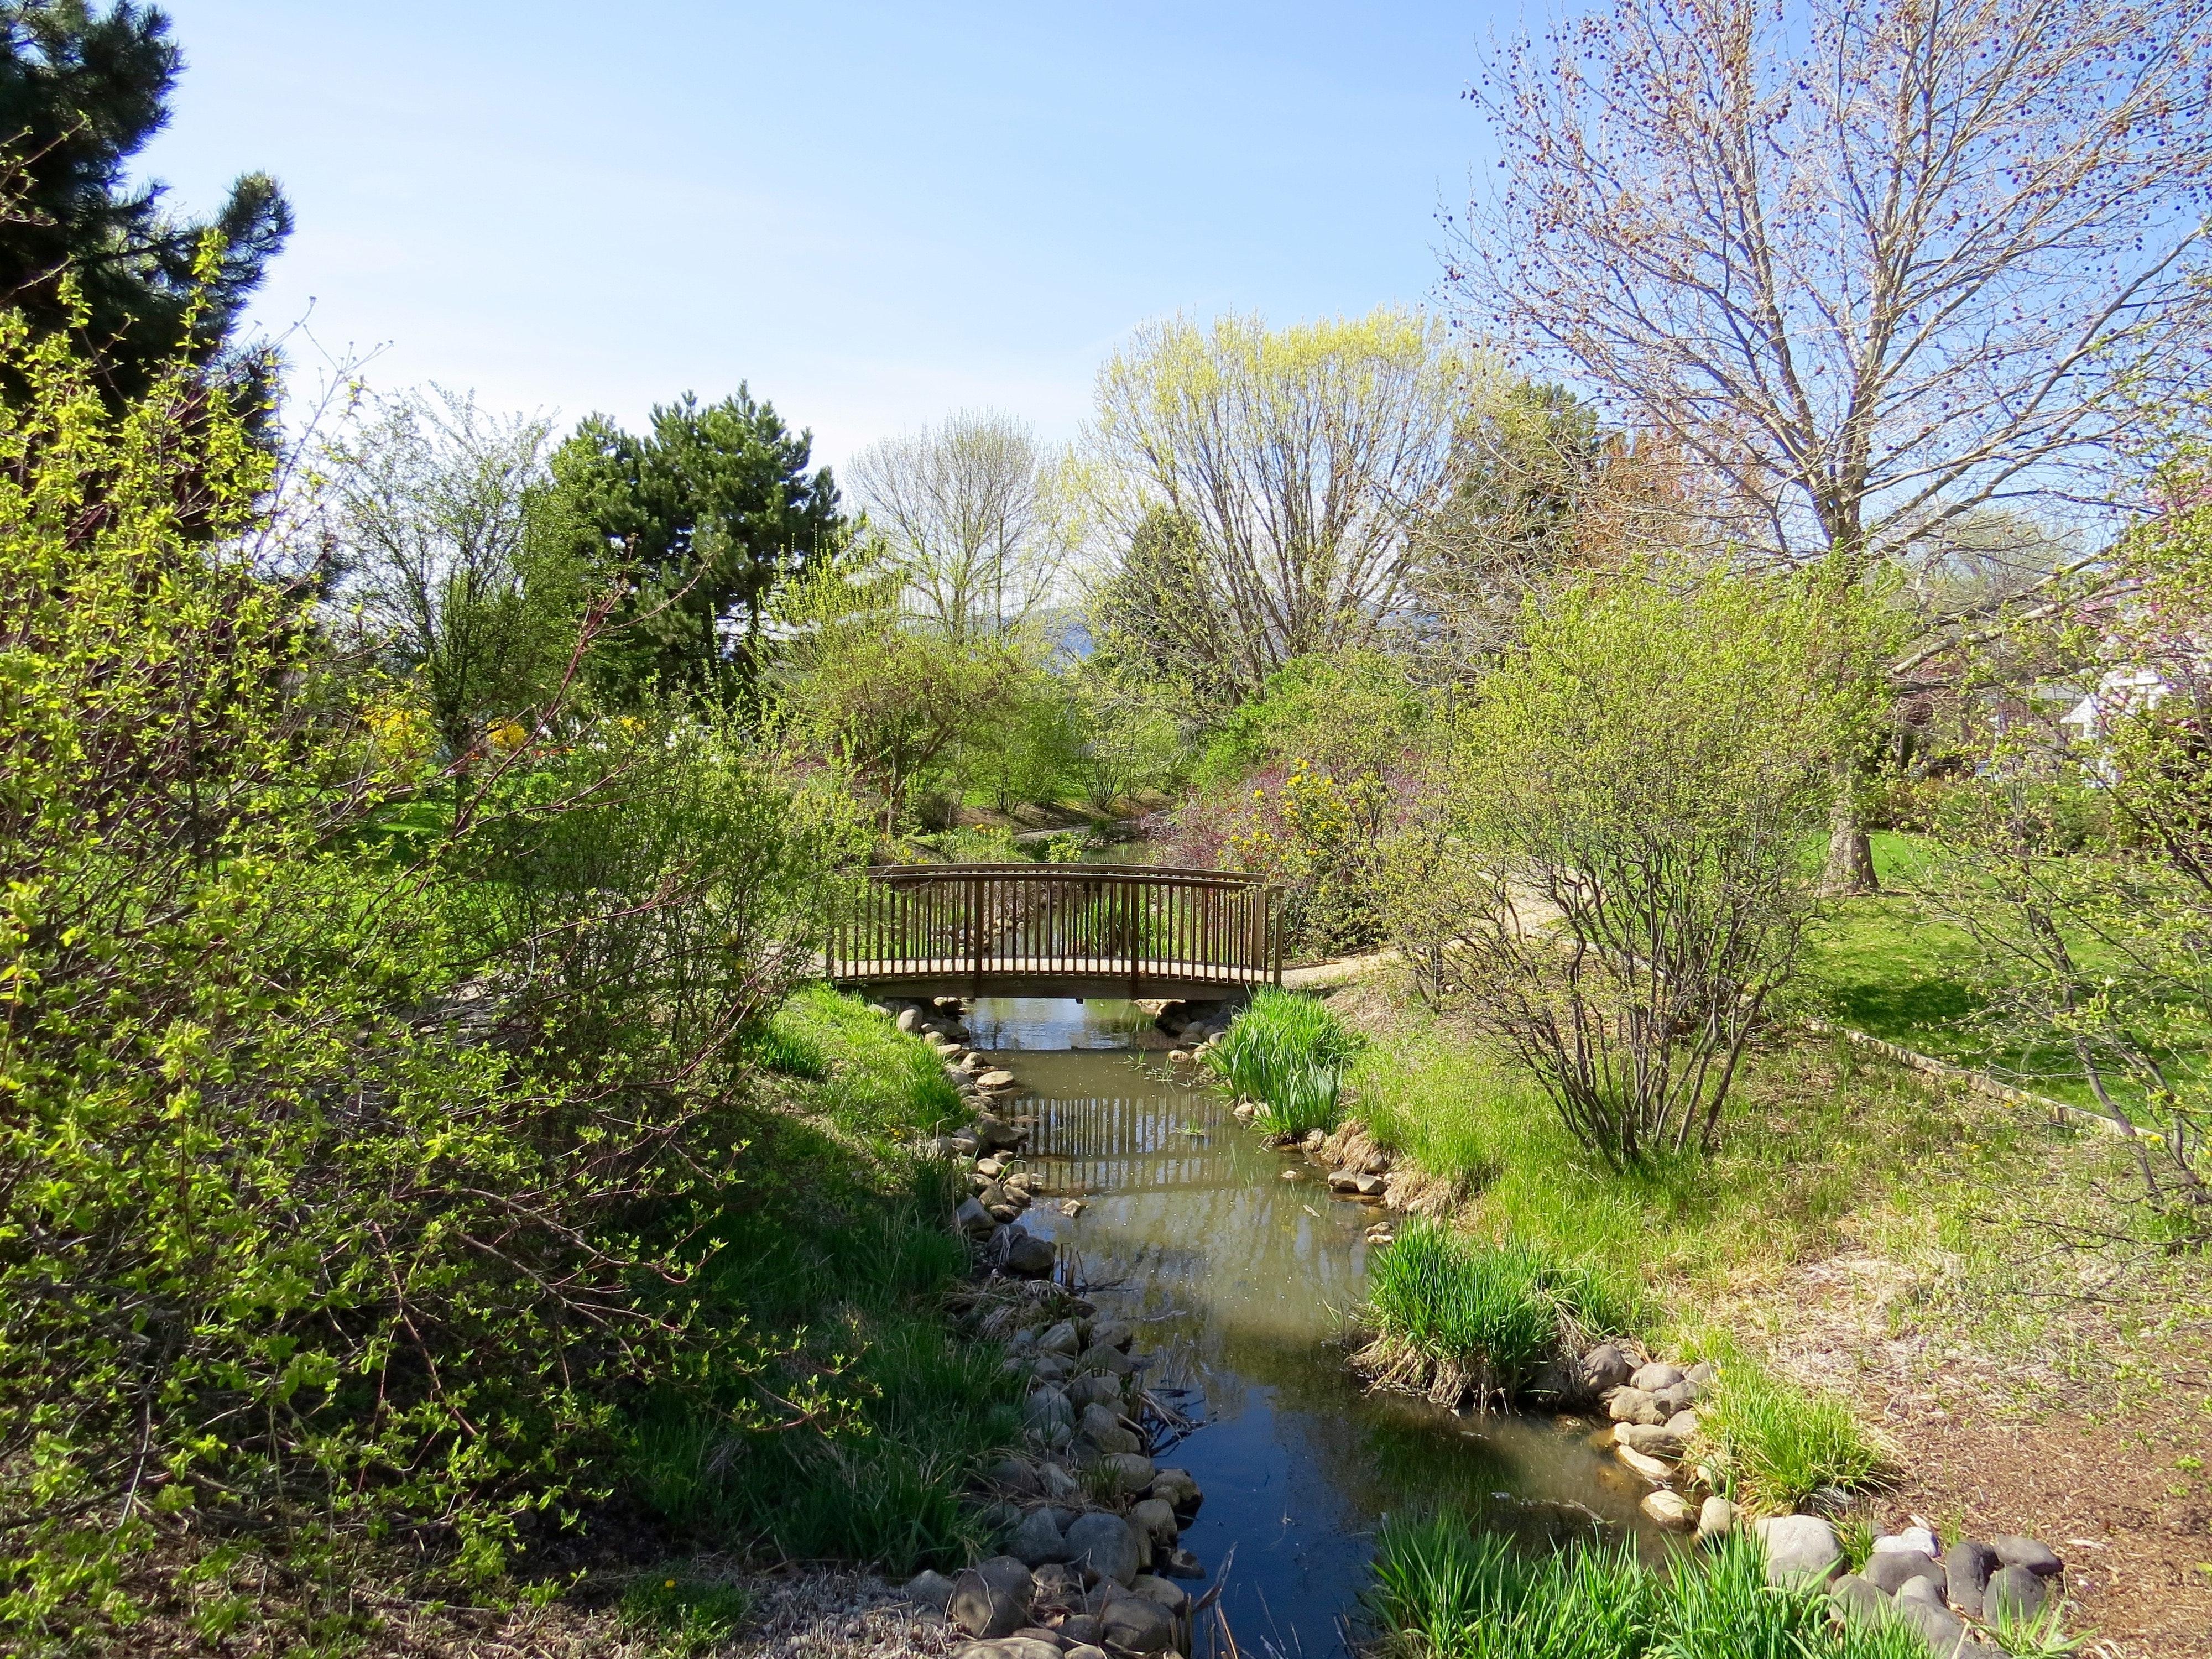 Bridge over body of water surround by greenery photo